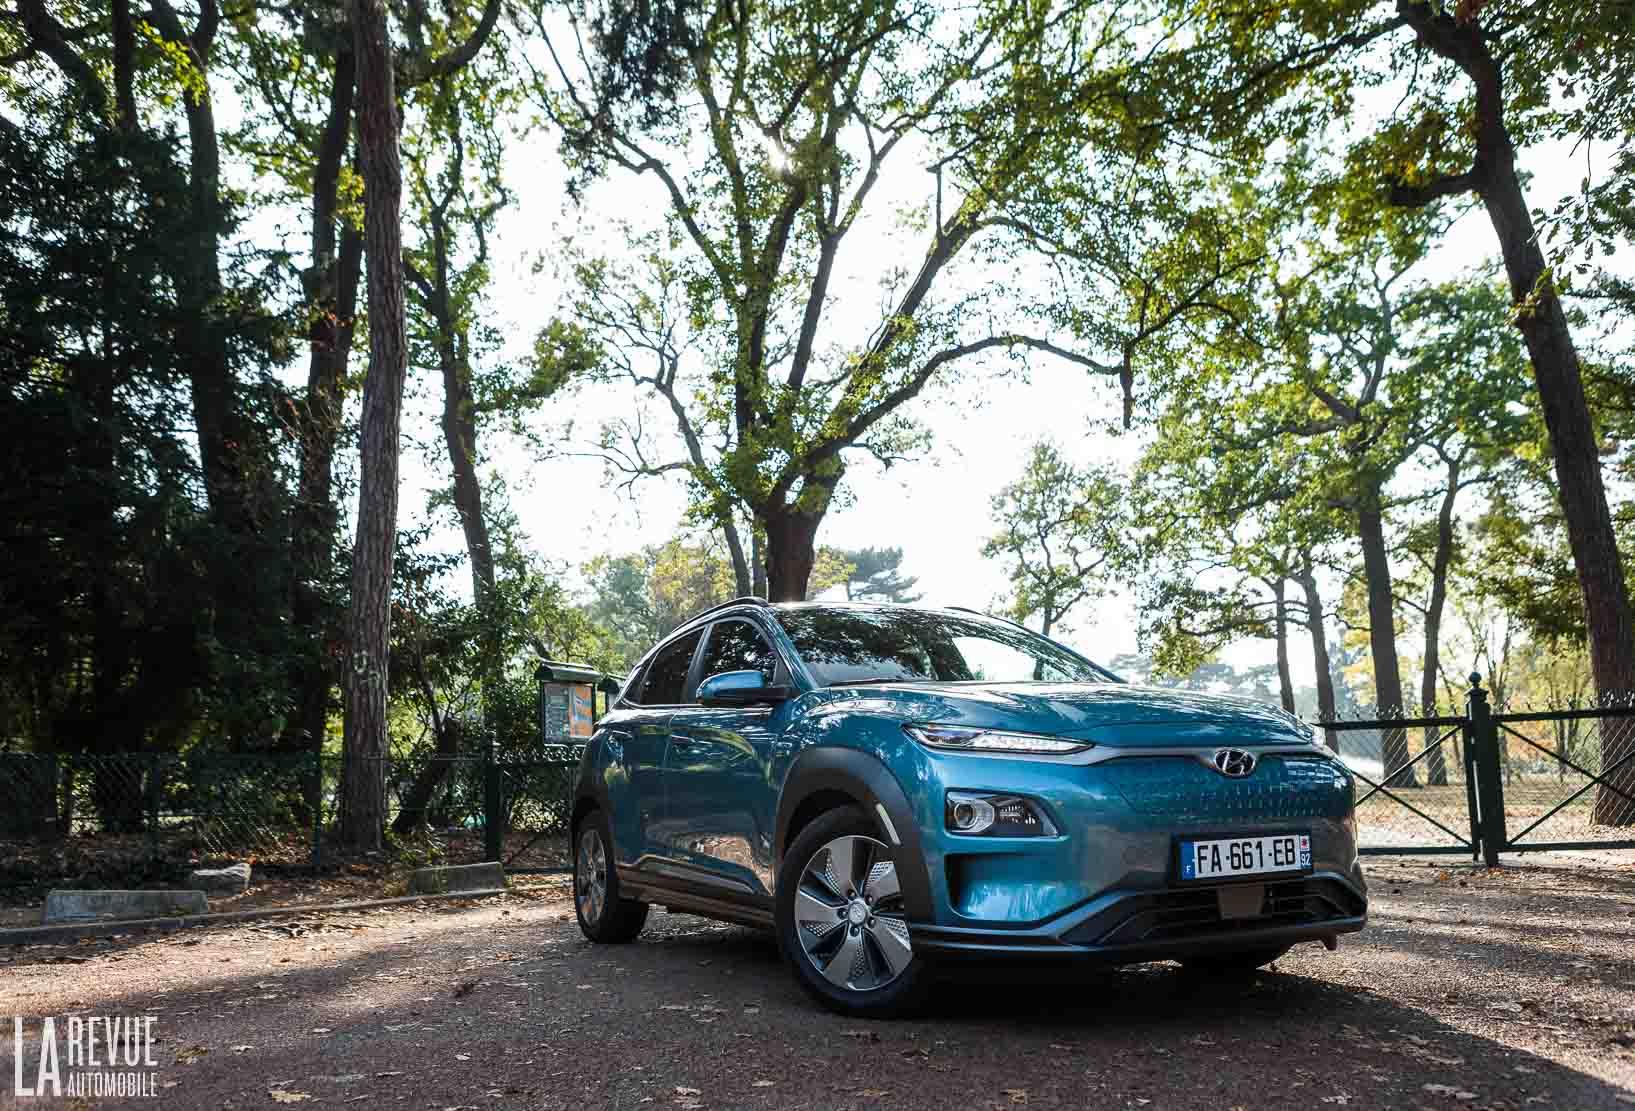 Essai du SUV urbain, le Hyundai KONA electric